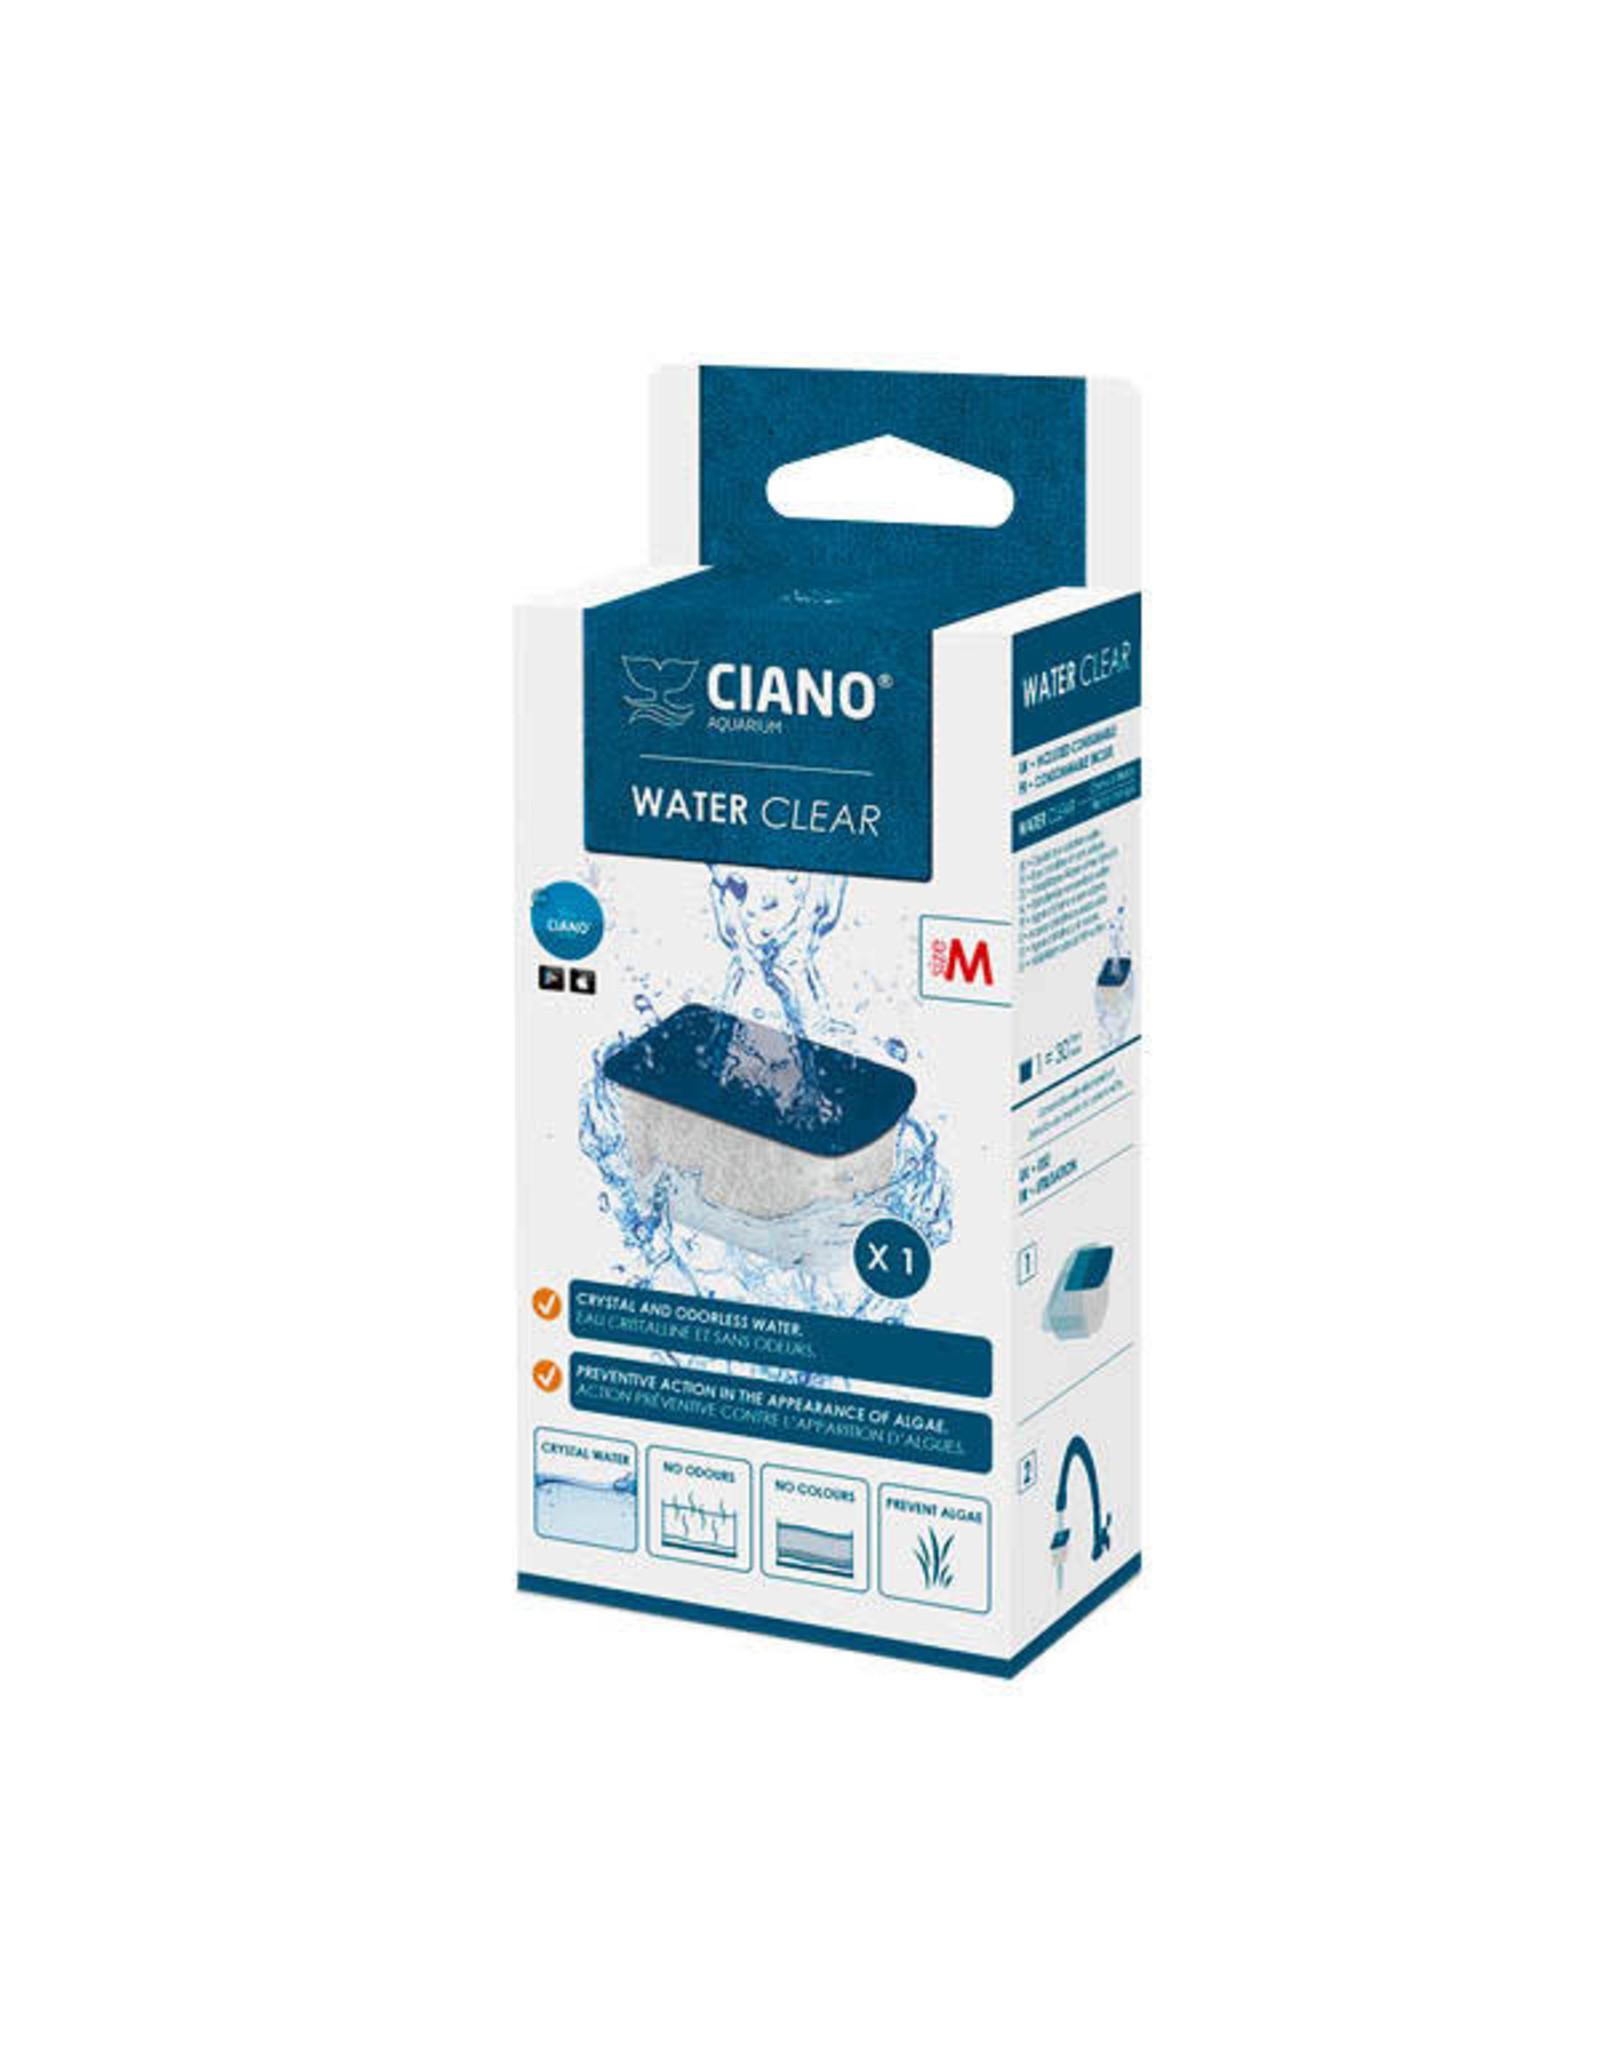 J&K Aquatics Ciano Water Clear (Carbon) Cartridge CF80 x 1